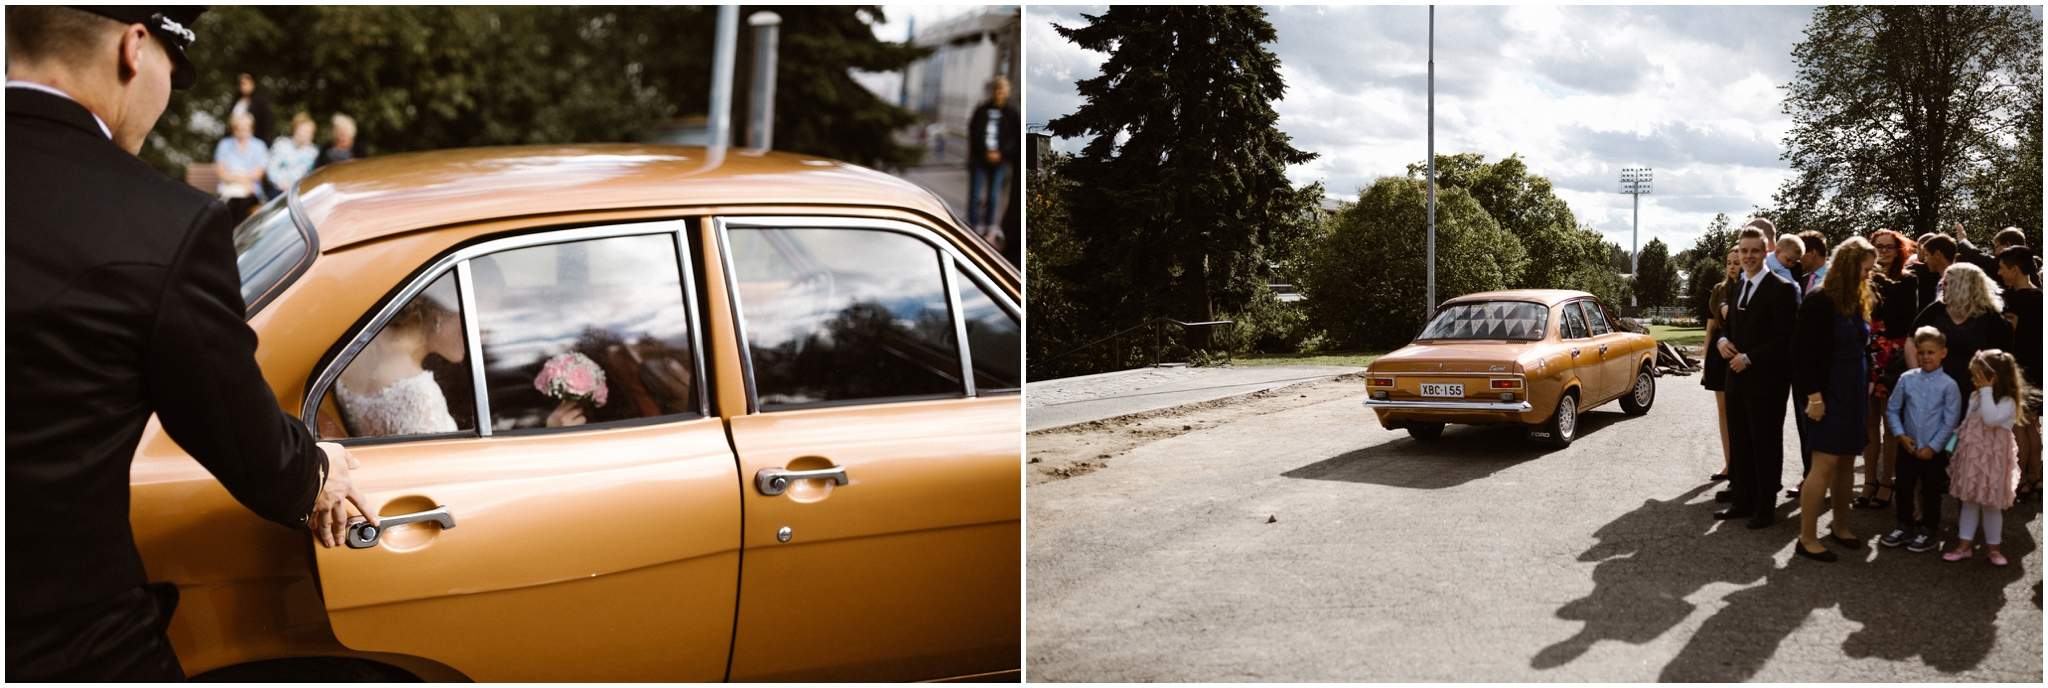 Pinja + Marko -- Patrick Karkkolainen Wedding Photographer-73.jpg